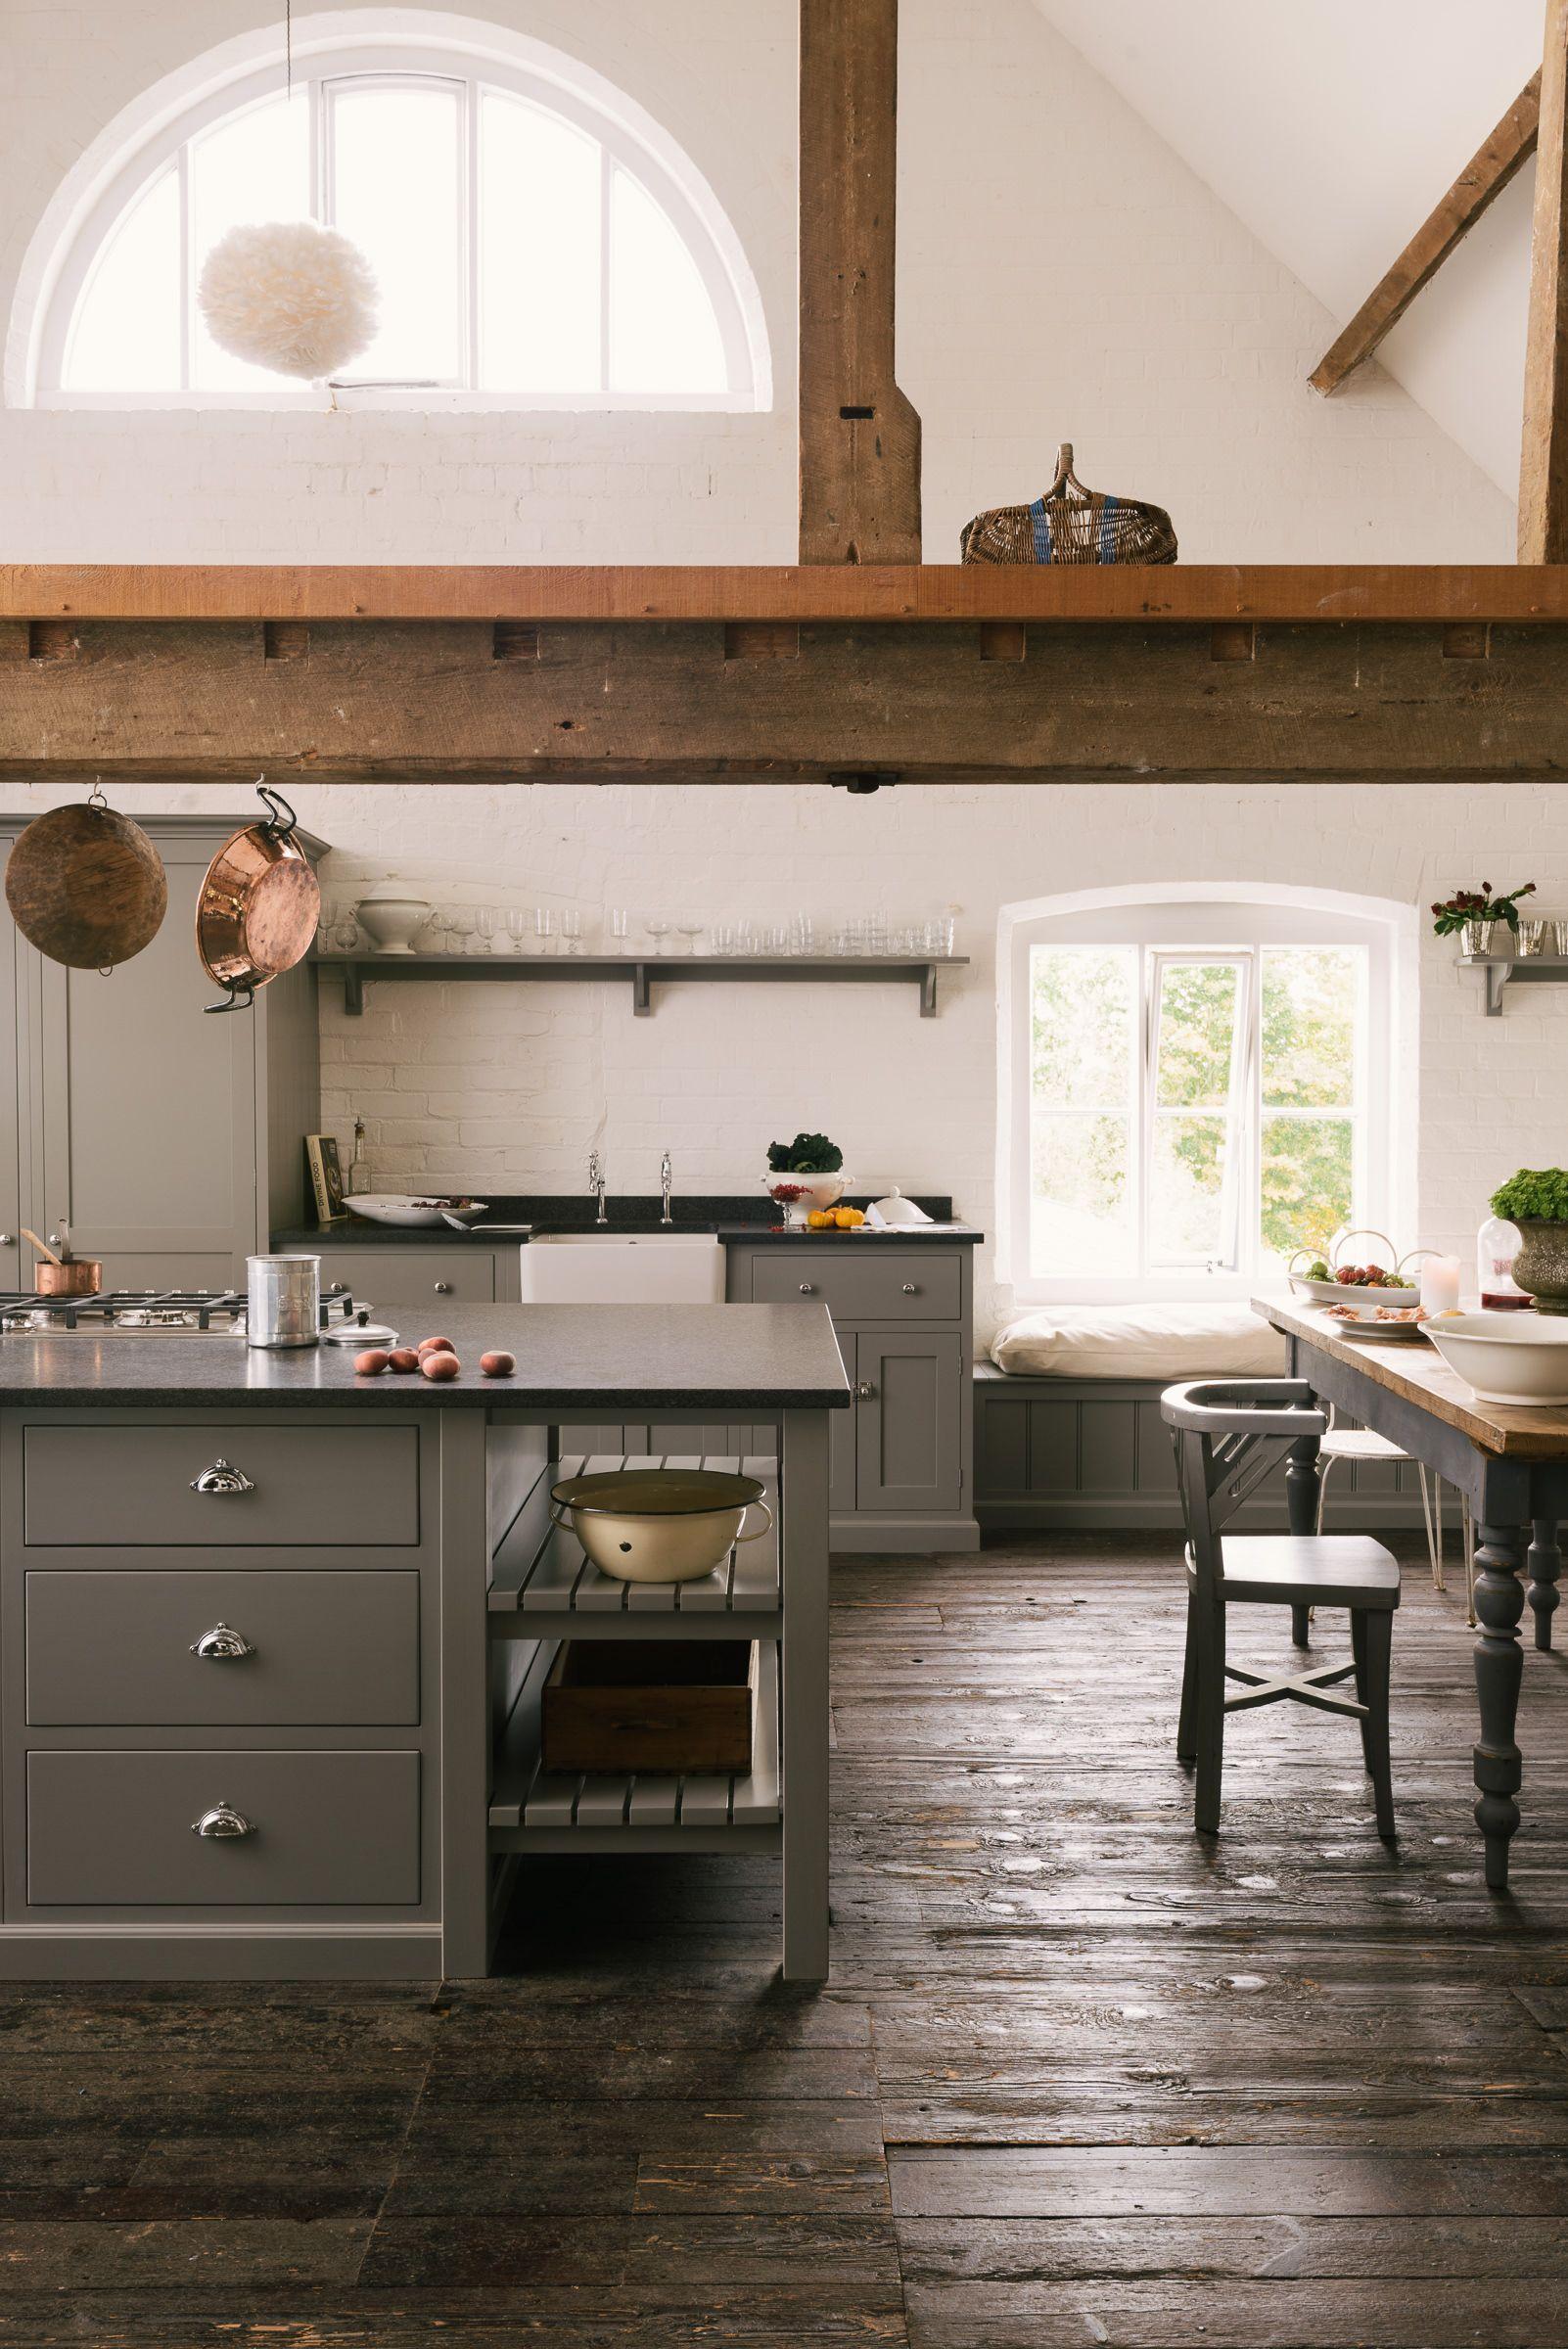 9 Sleek & Inspiring Luxury Kitchen Design Ideas Photos   Pinterest ...